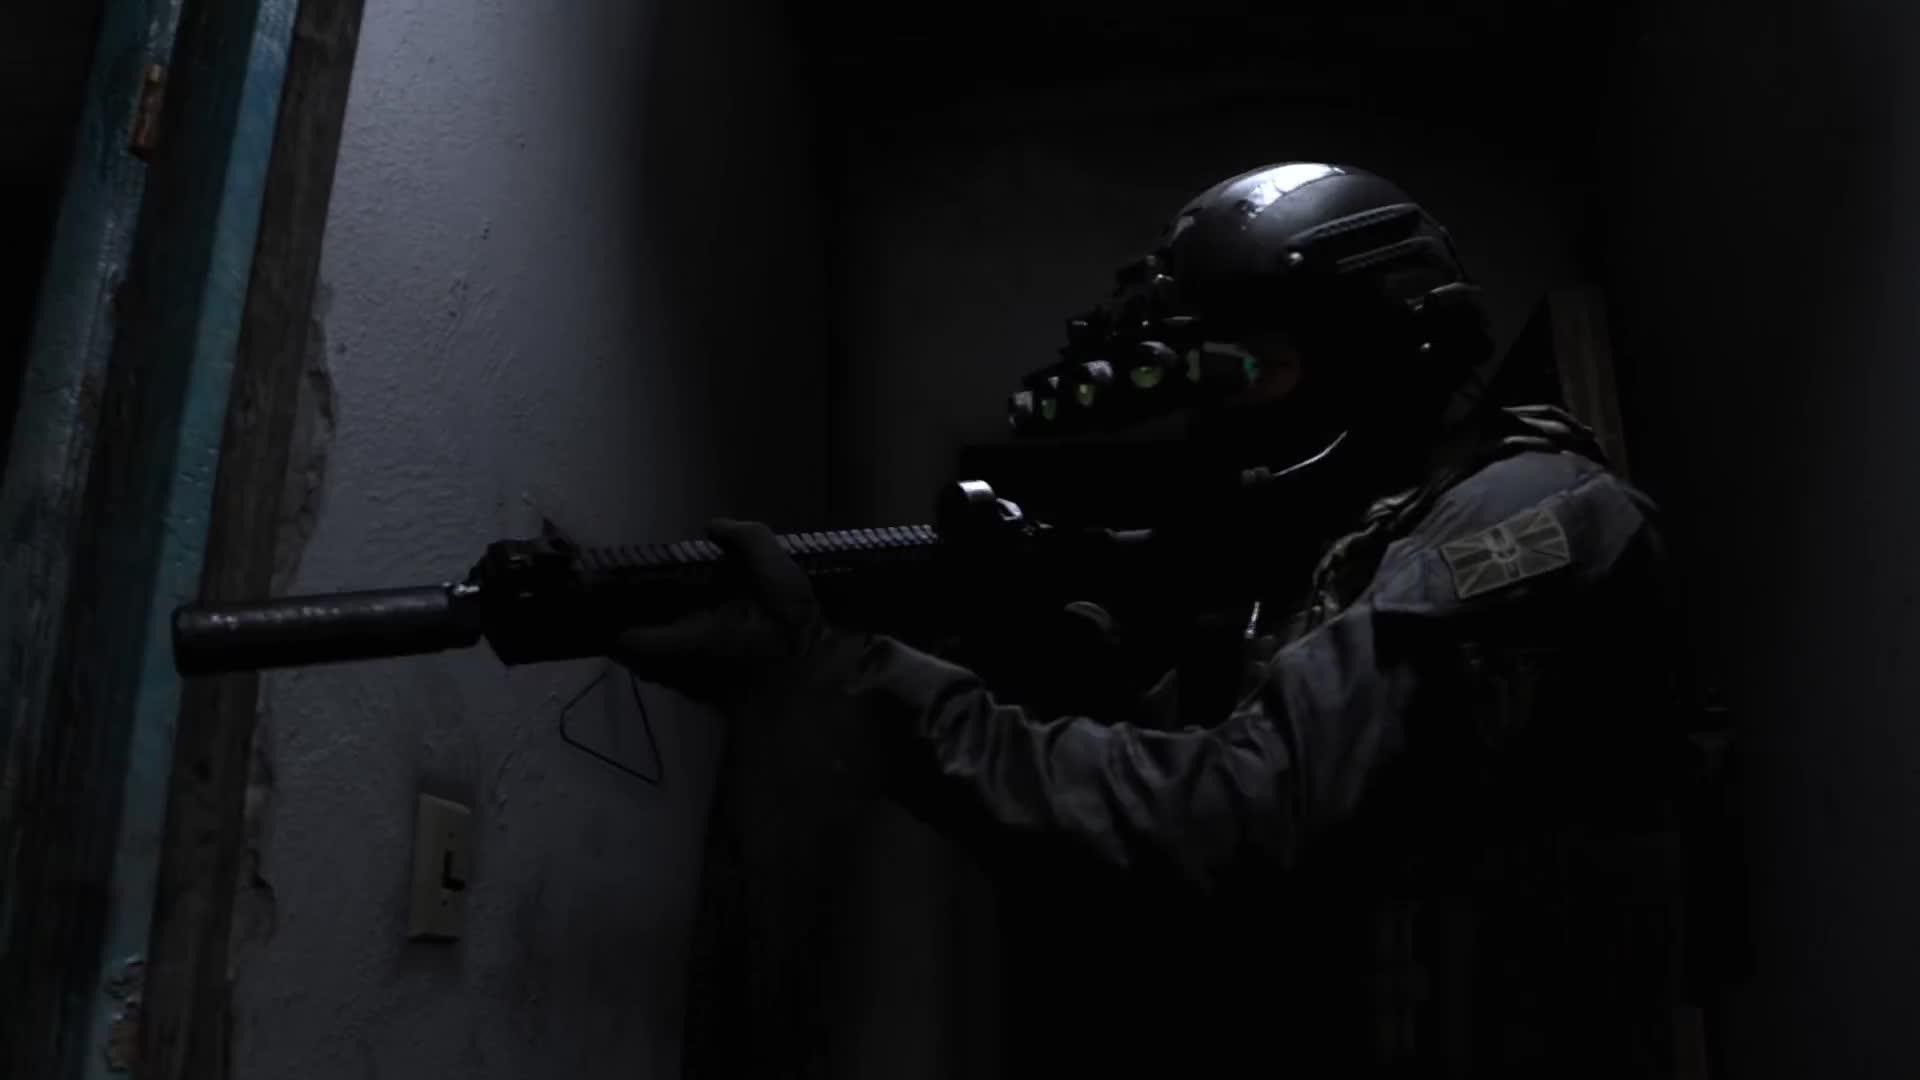 Trailer, Ego-Shooter, Call of Duty, Activision, Infinity Ward, Modern Warfare, Cross-Play, Crossplay, Call of Duty: Modern Warfare